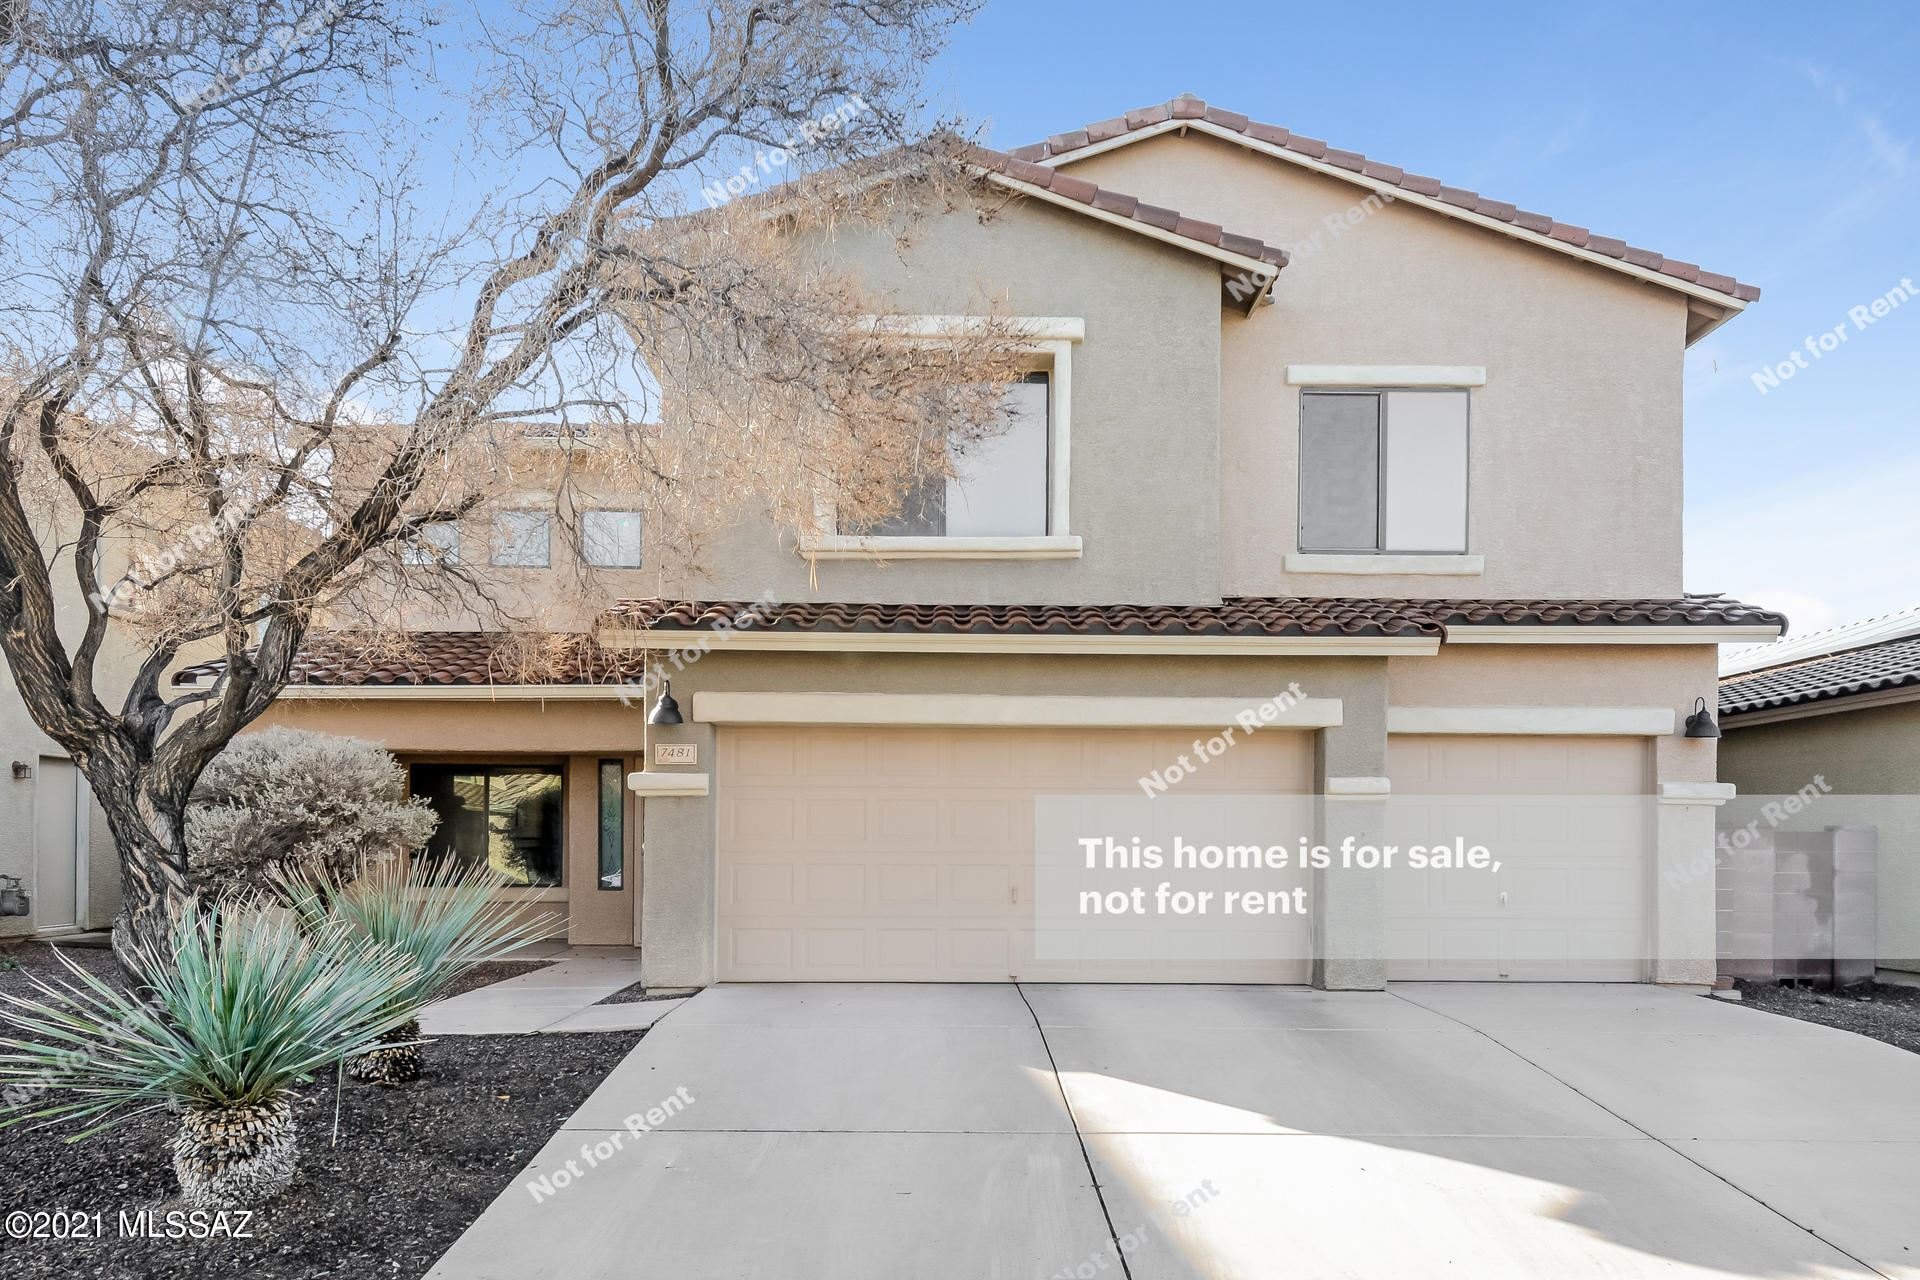 7481 W Shining Amber Lane, Tucson, AZ 85743 - #: 22102763